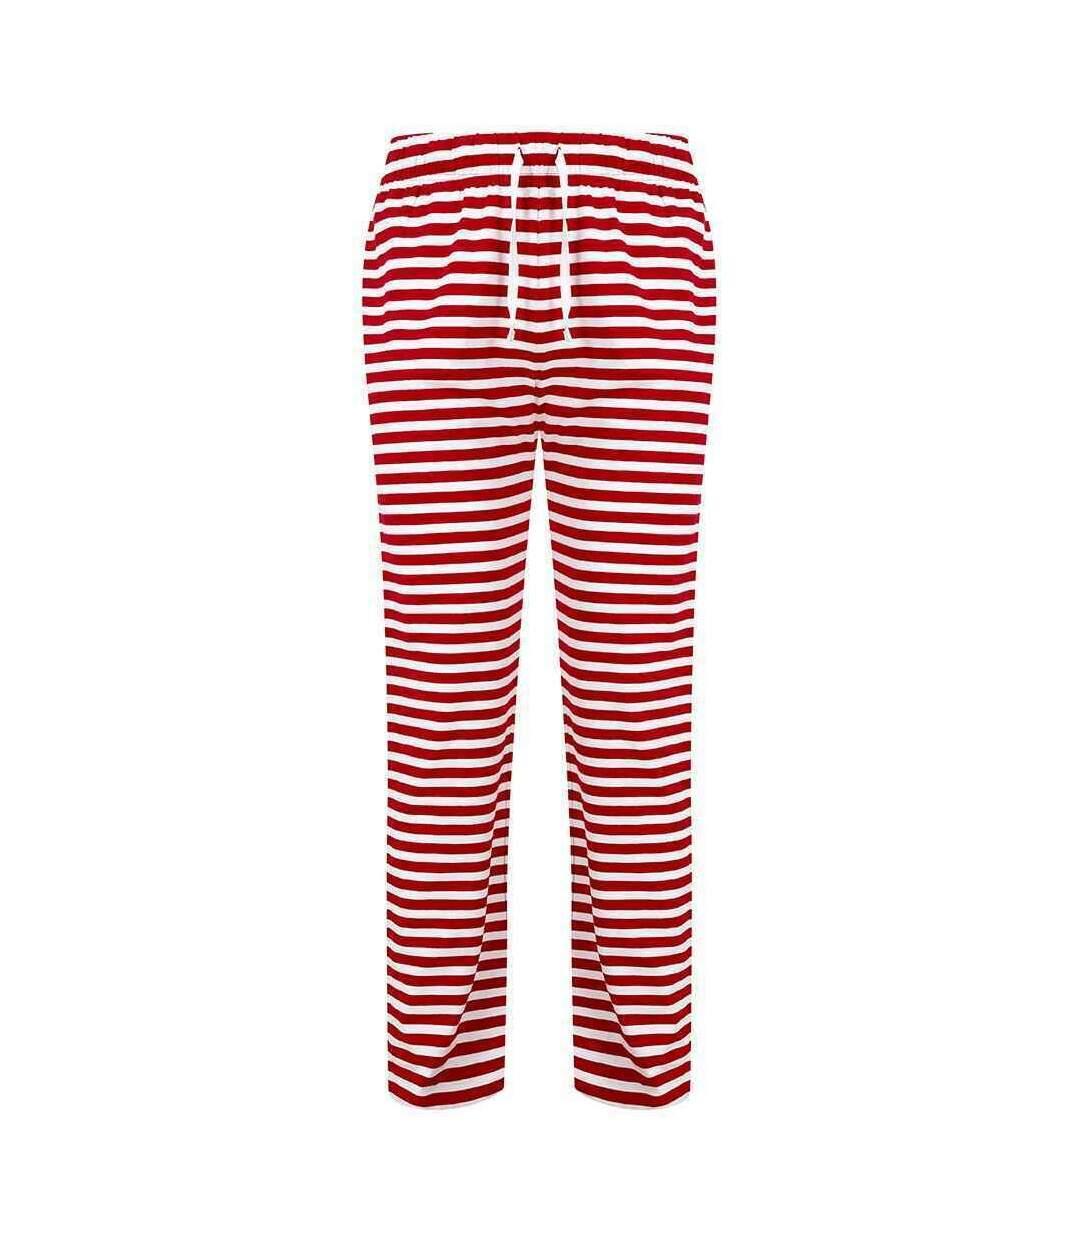 Skinni Fit Mens Lounge Pants (Red/White) - UTRW7996